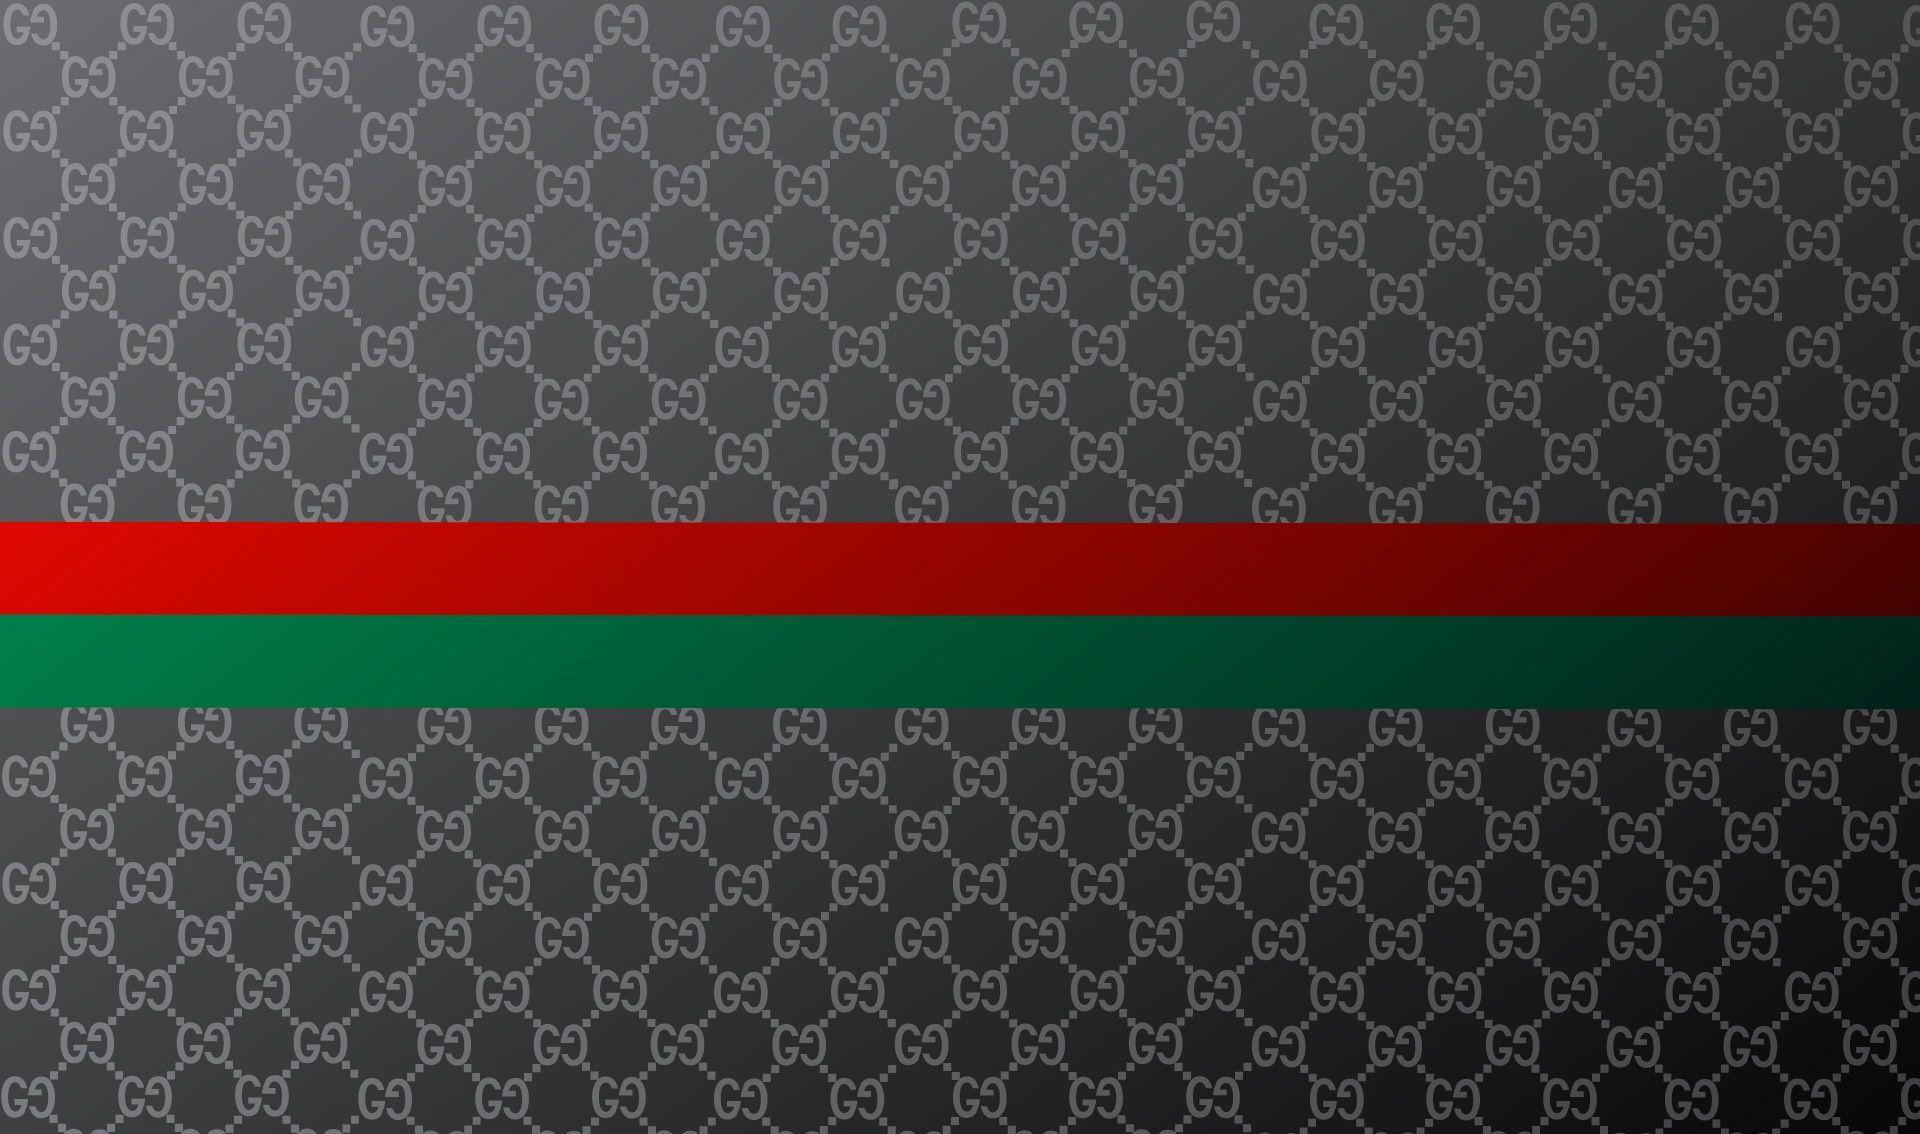 Desktop Free Download Gucci Wallpapers Hd Gucci Wallpaper Iphone Gucci Pattern Louis Vuitton Iphone Wallpaper